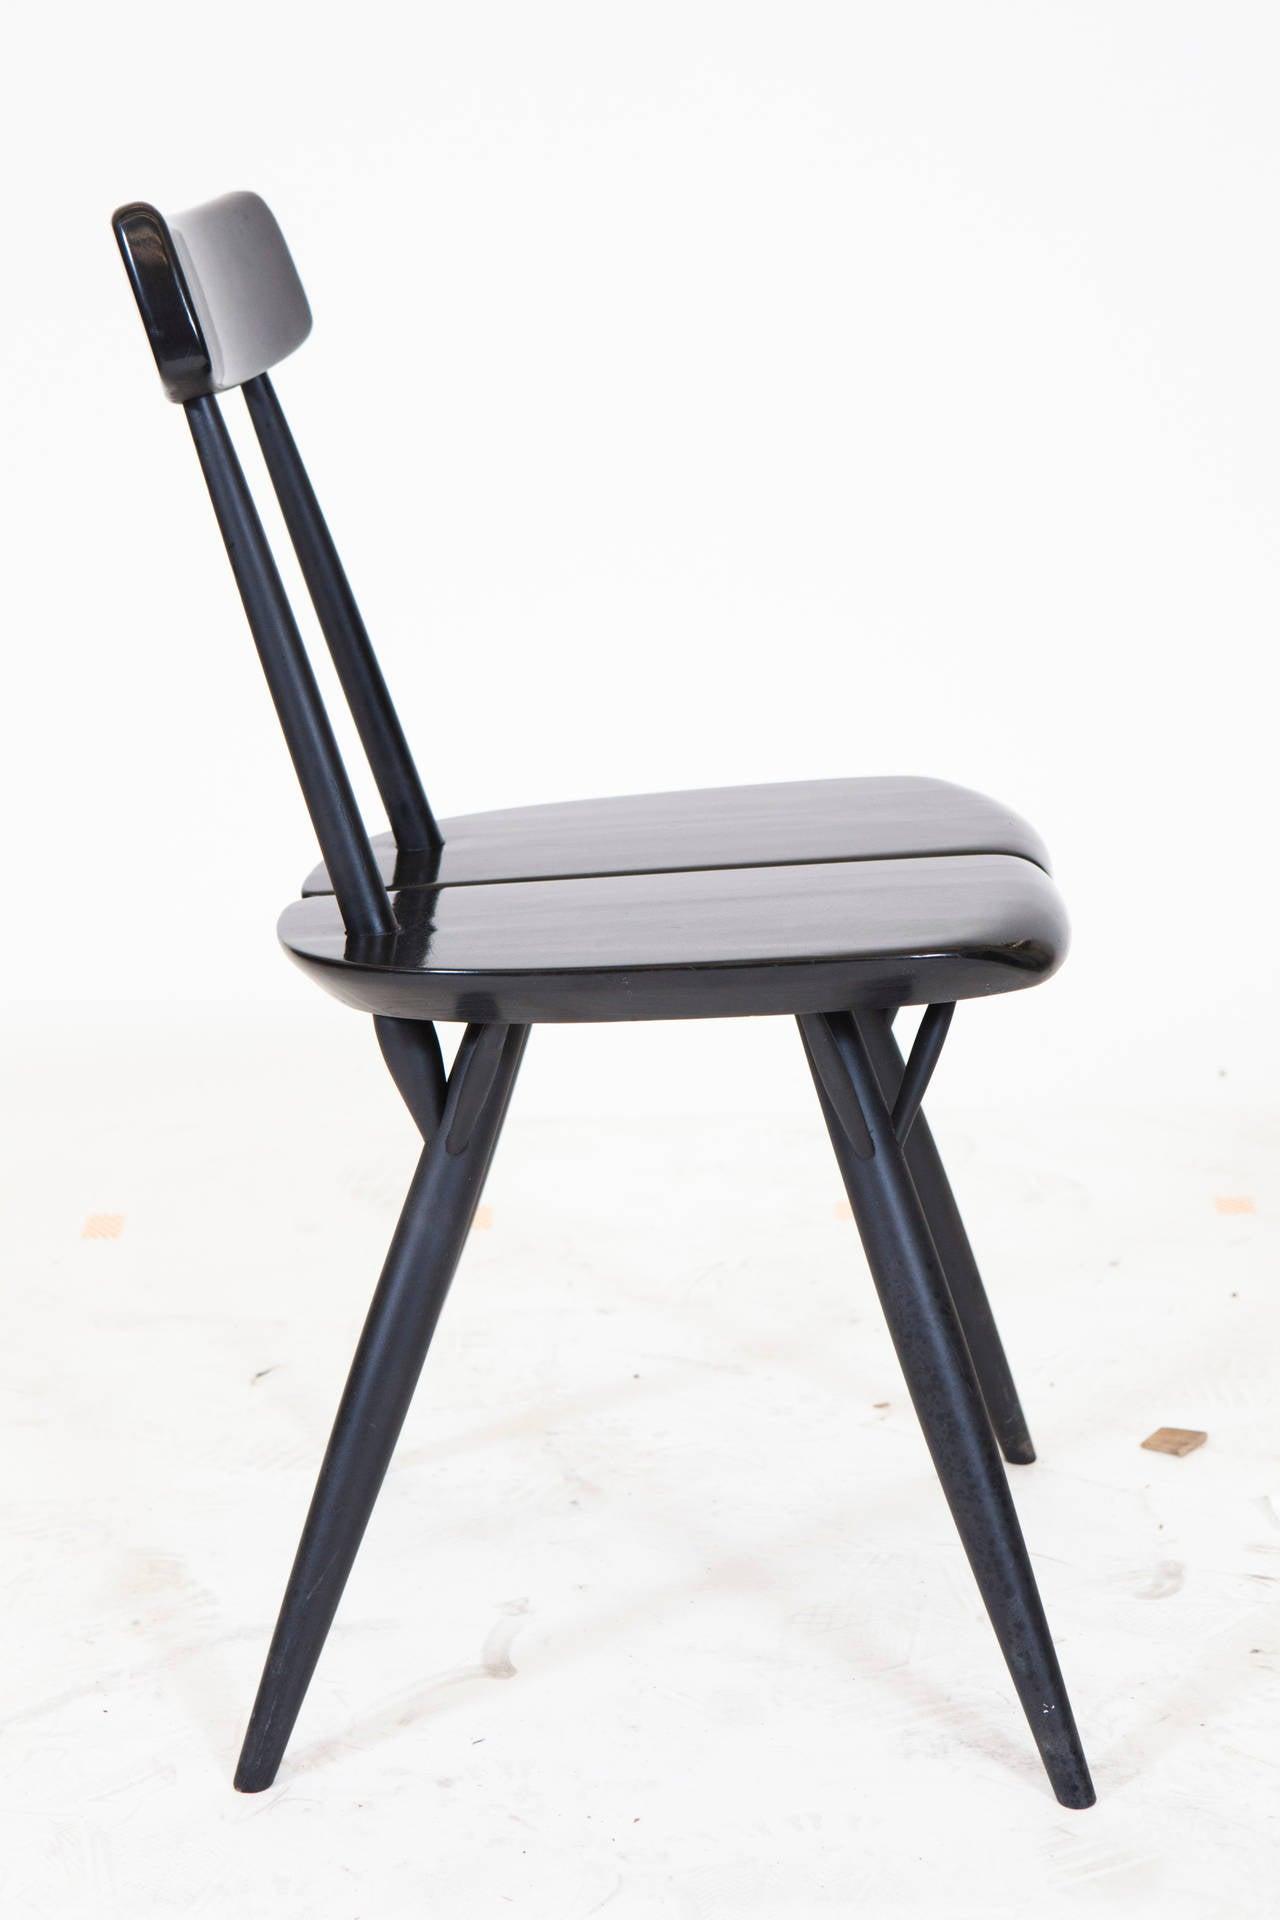 Pirkka Table and Chairs by Ilmari Taplovaara For Sale 1